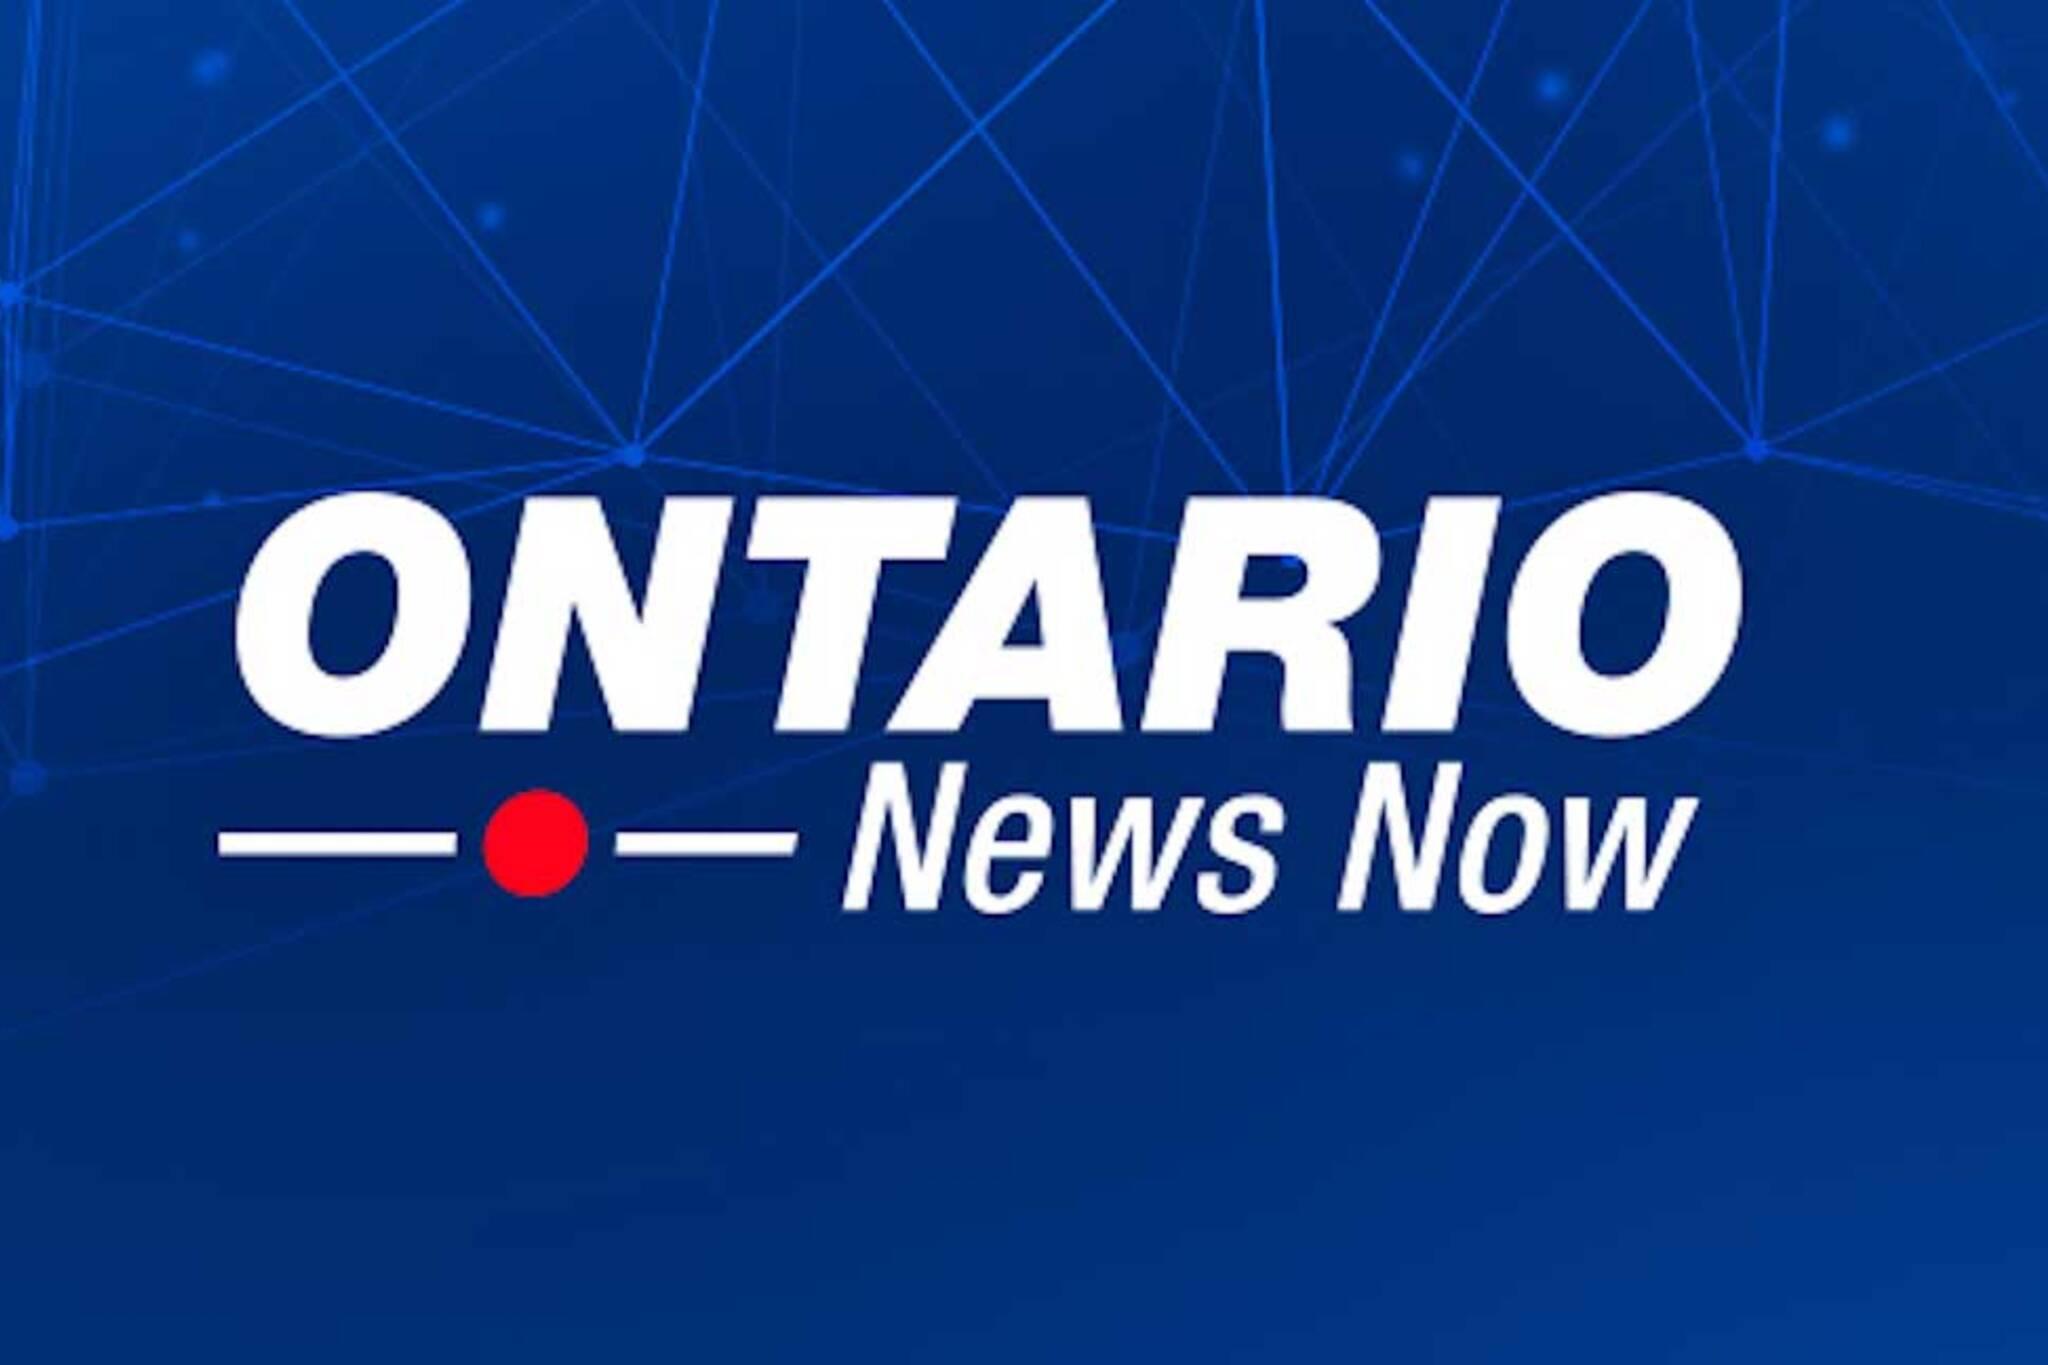 Ontario News Now